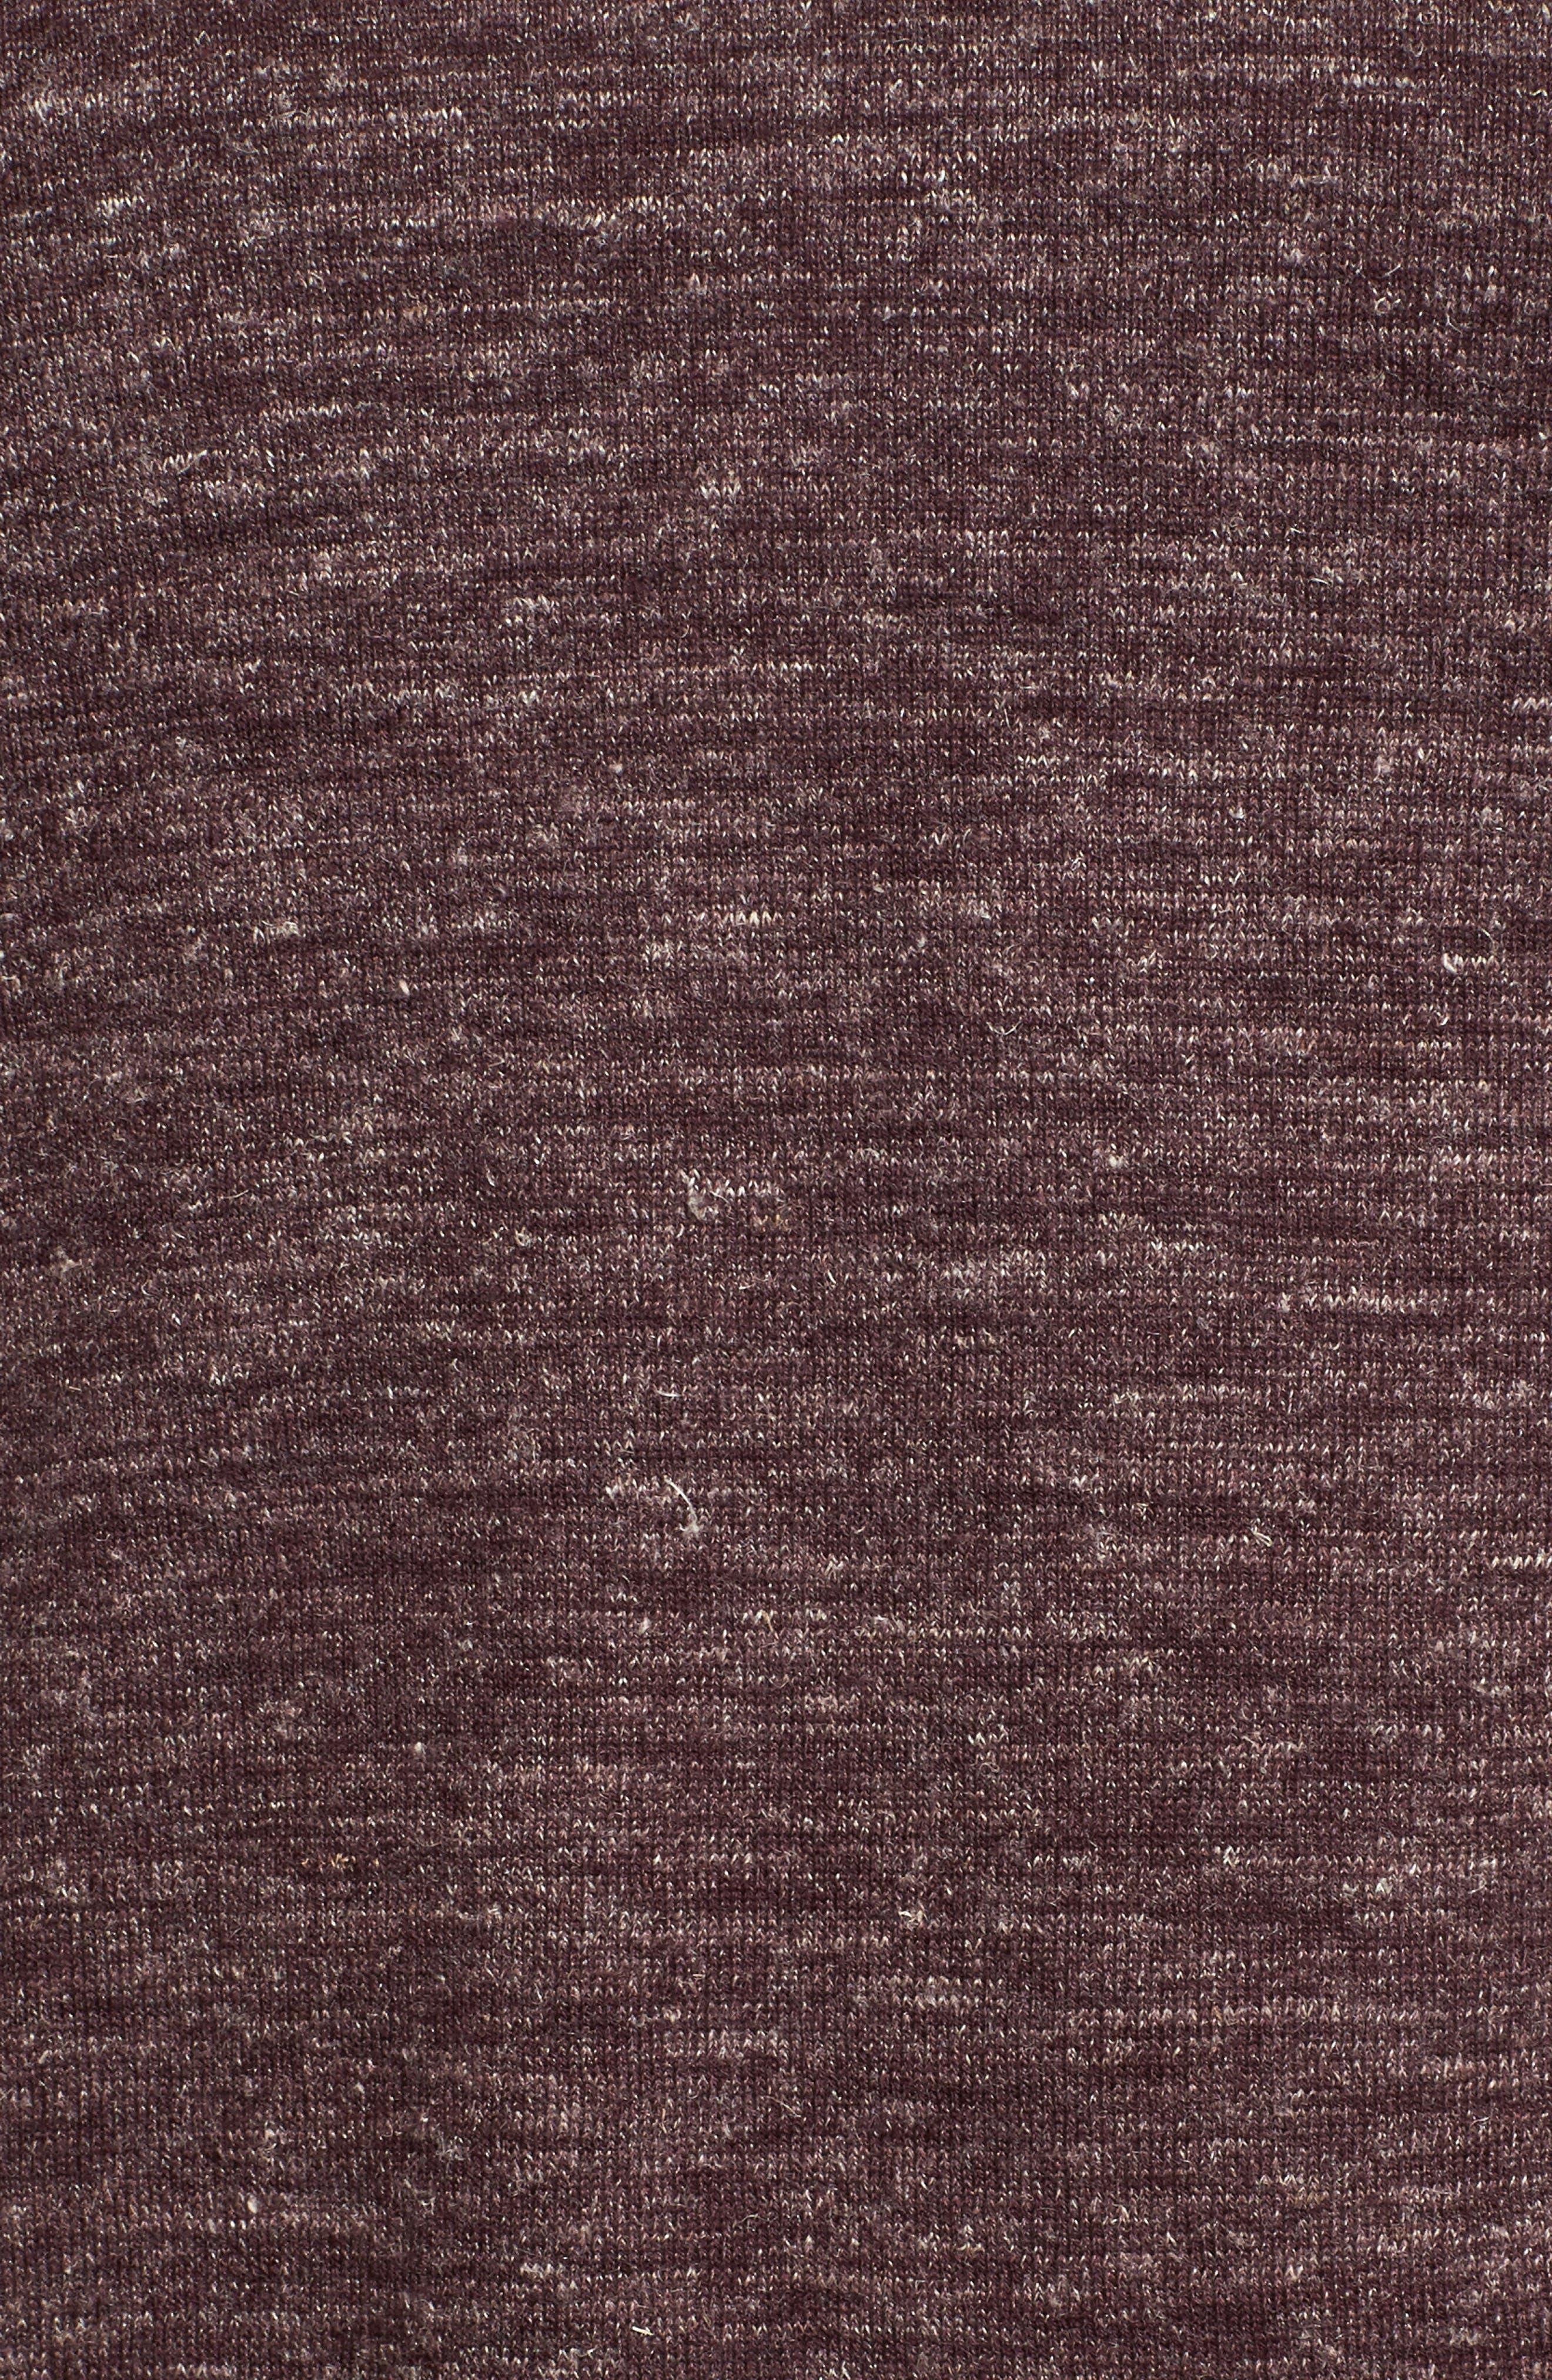 Heathered Crewneck Sweater,                             Alternate thumbnail 5, color,                             609